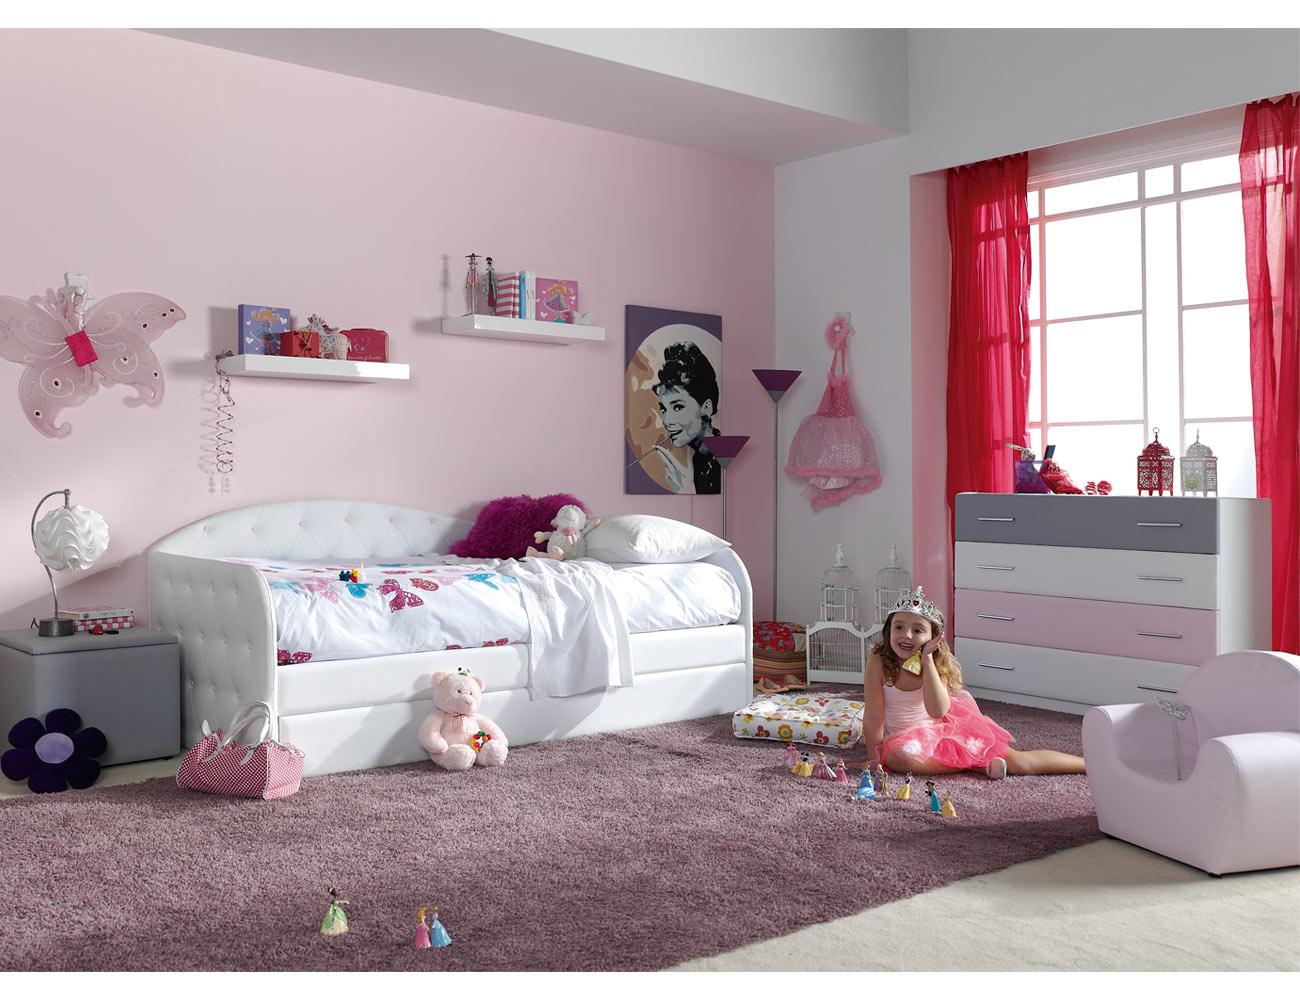 243 cama nido17